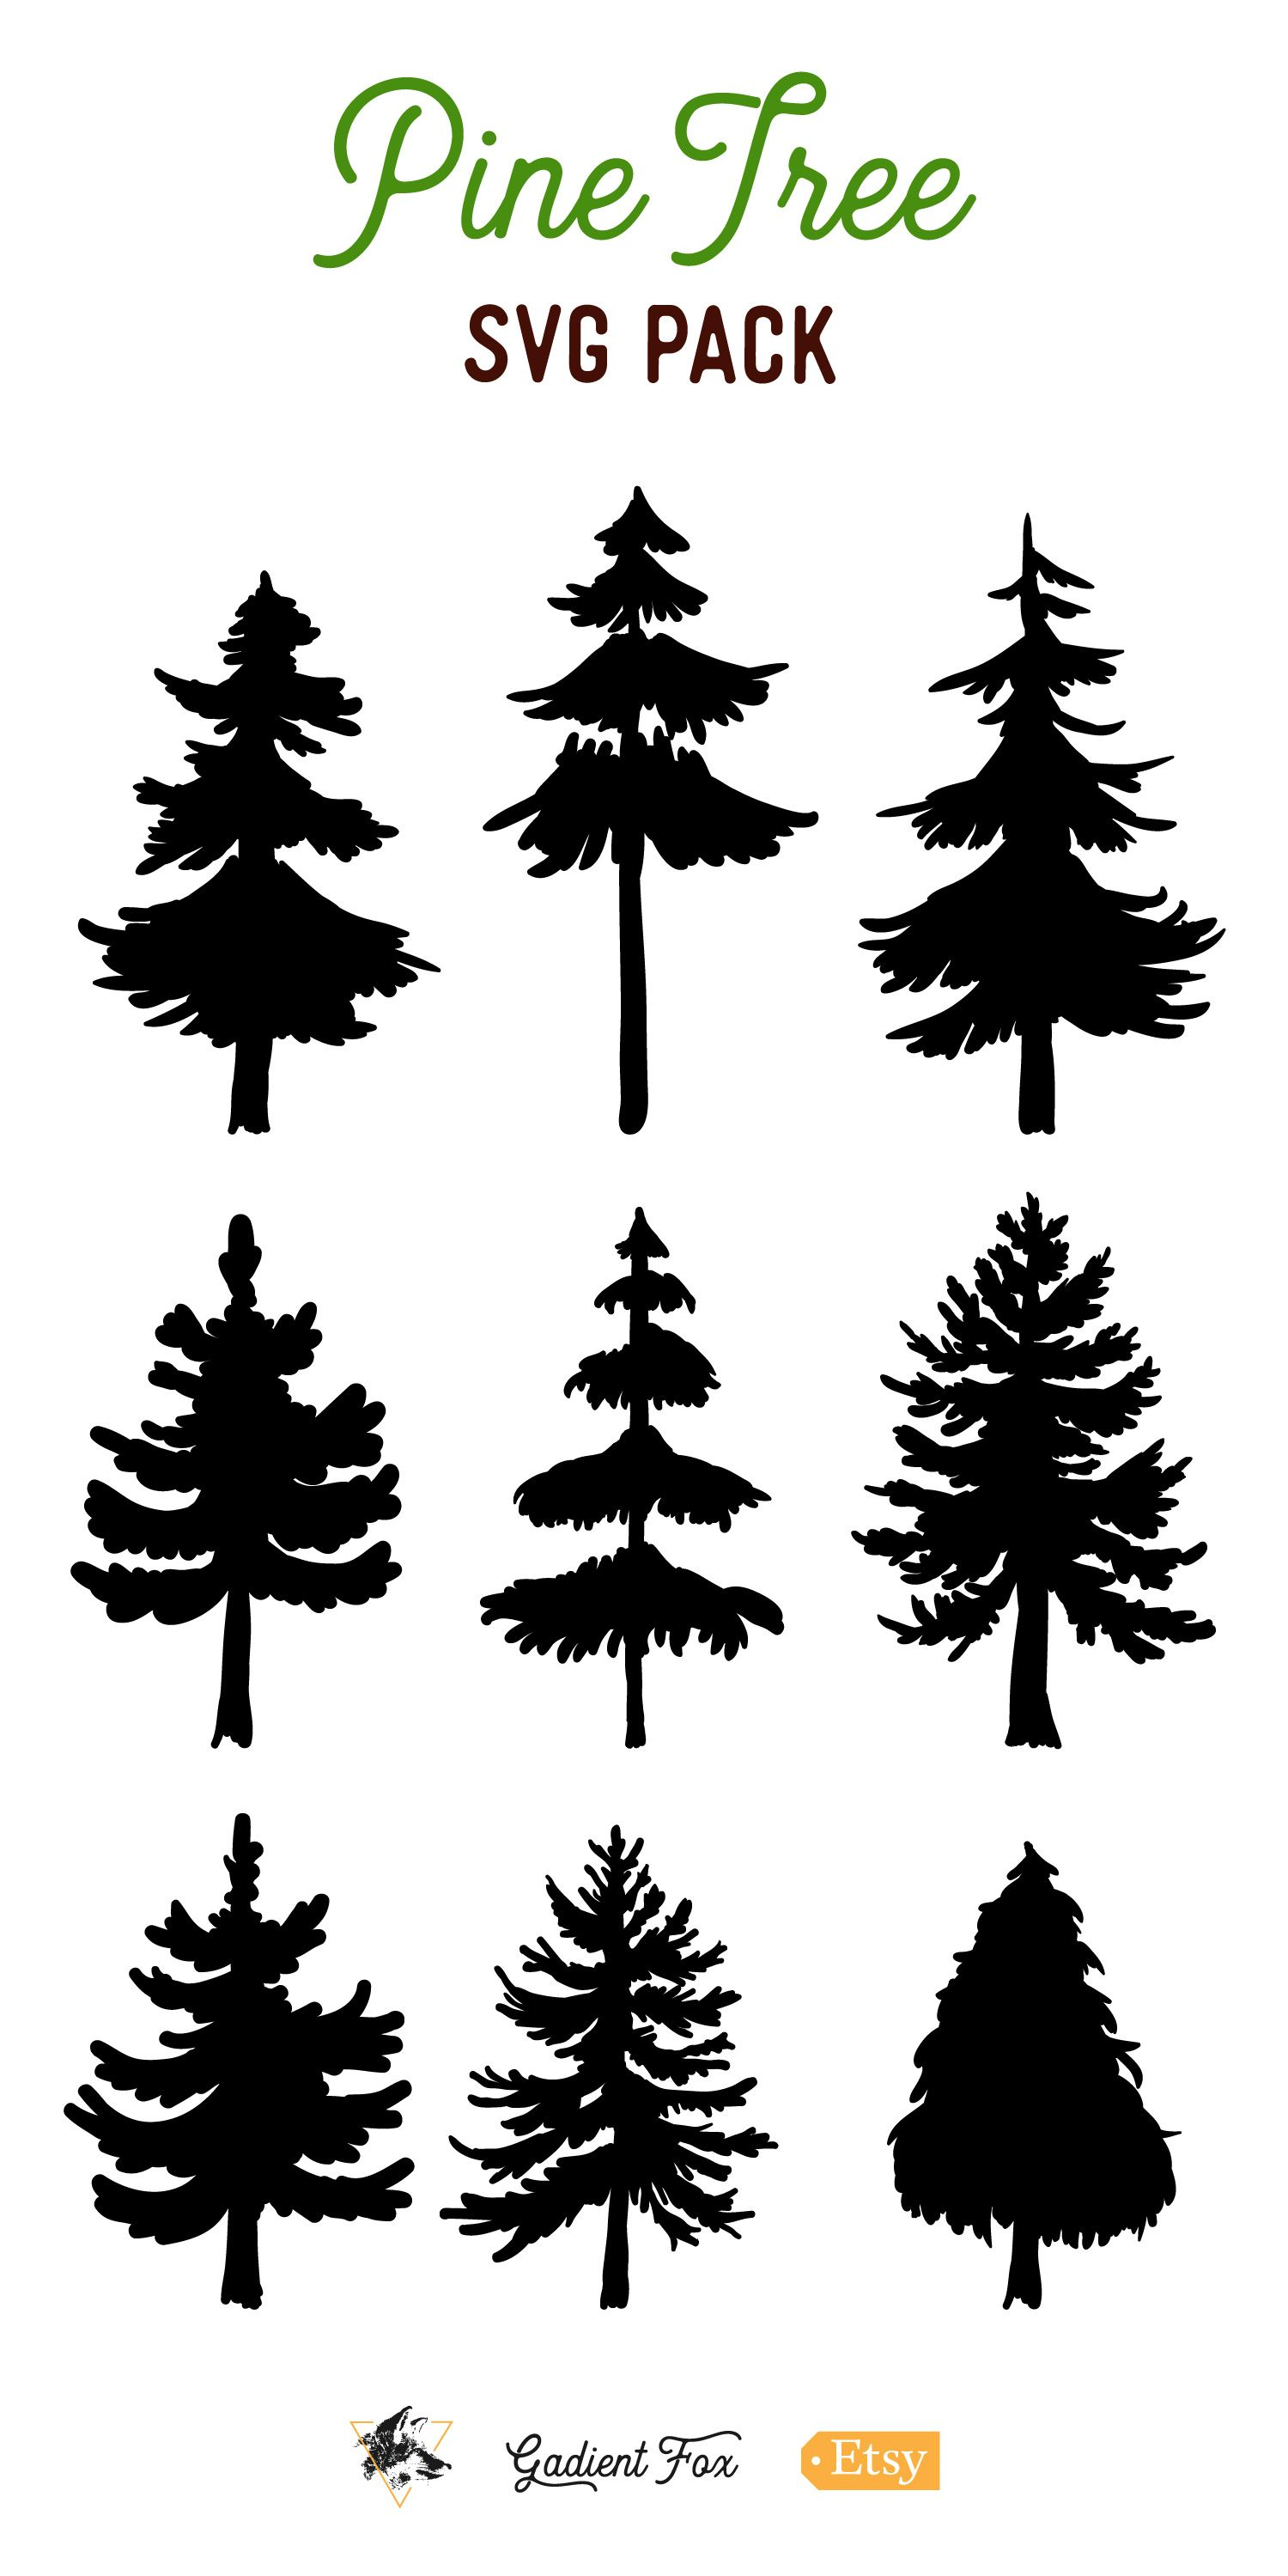 9 Vector Pine Tree Silhouette Illustrations (155339) | Illustrations | Design Bundles